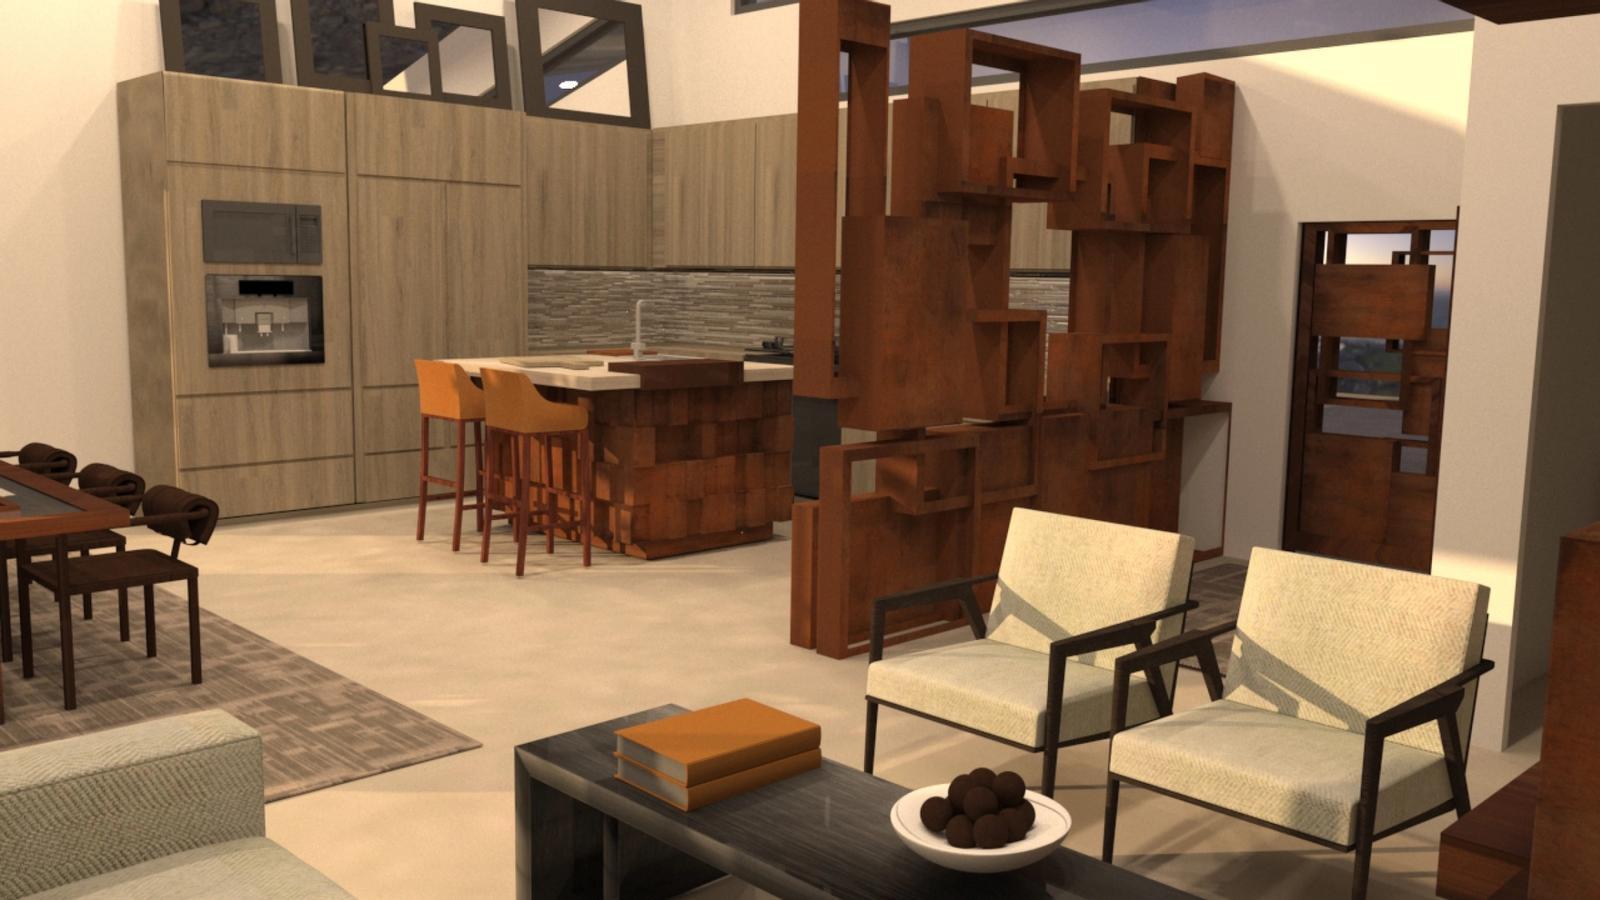 Artist Studio Loft - Kitchen at Noon